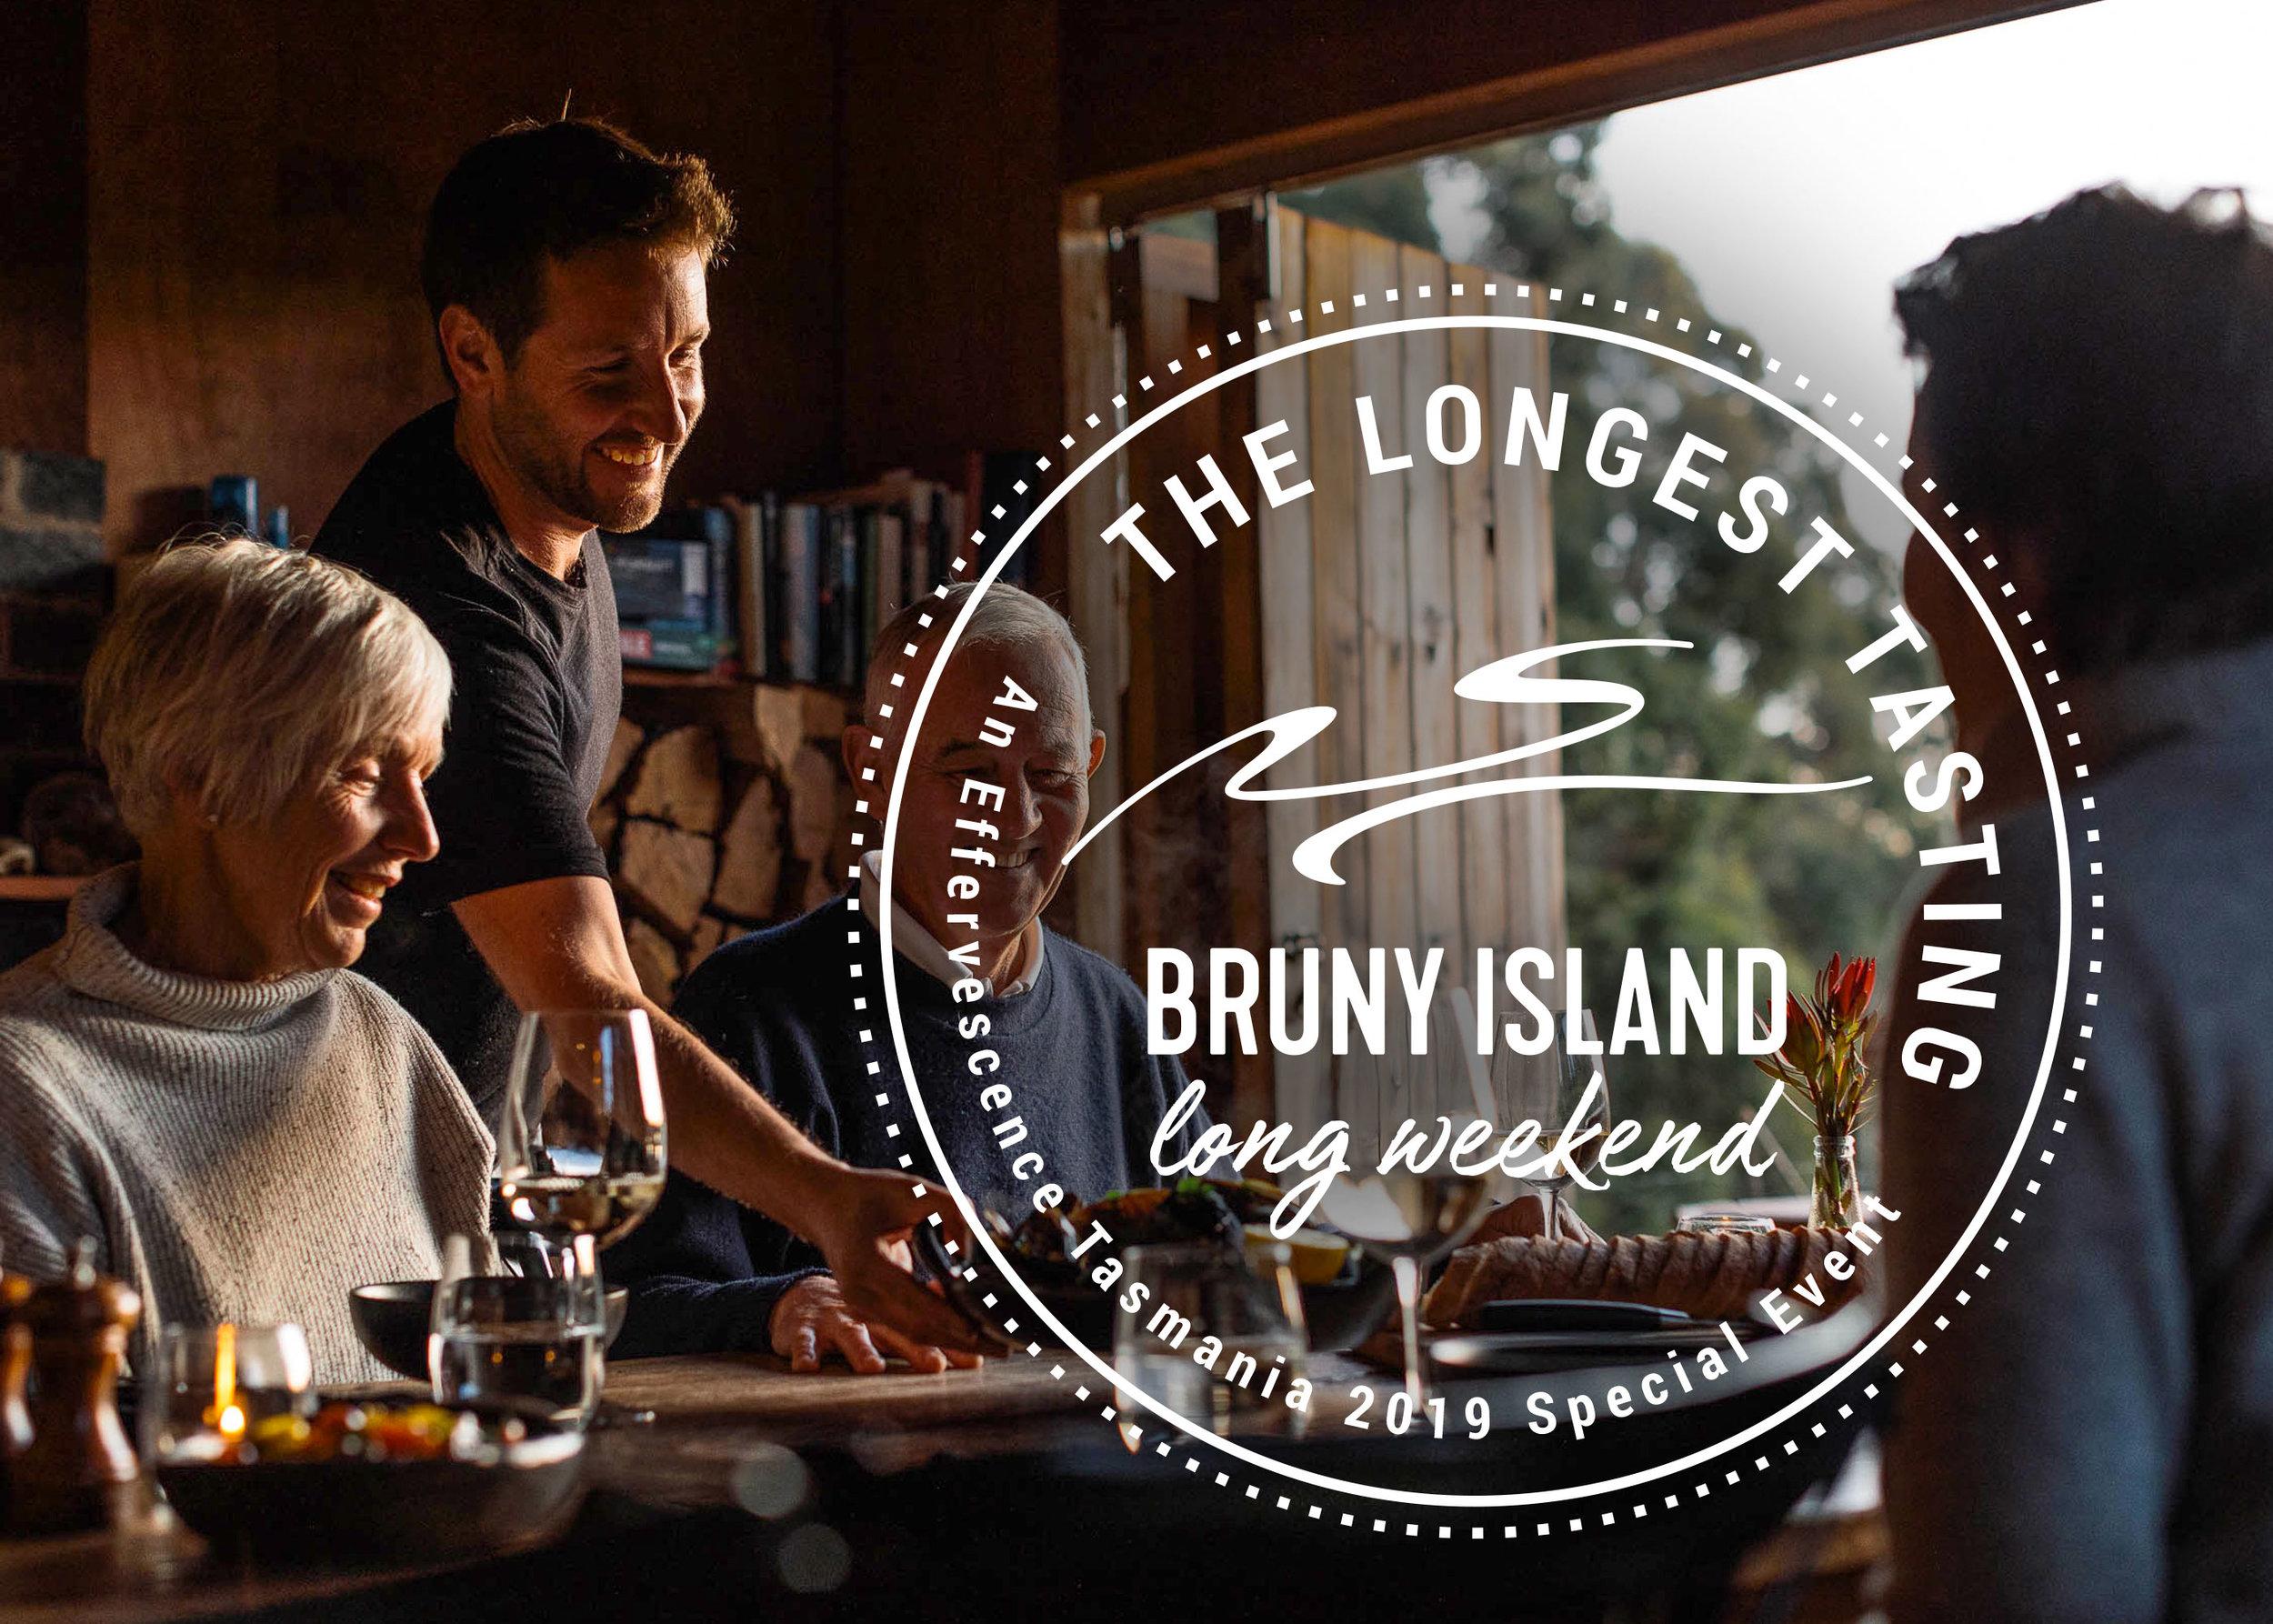 LongestTasting-BrunyIsland-Horz-2a.jpg